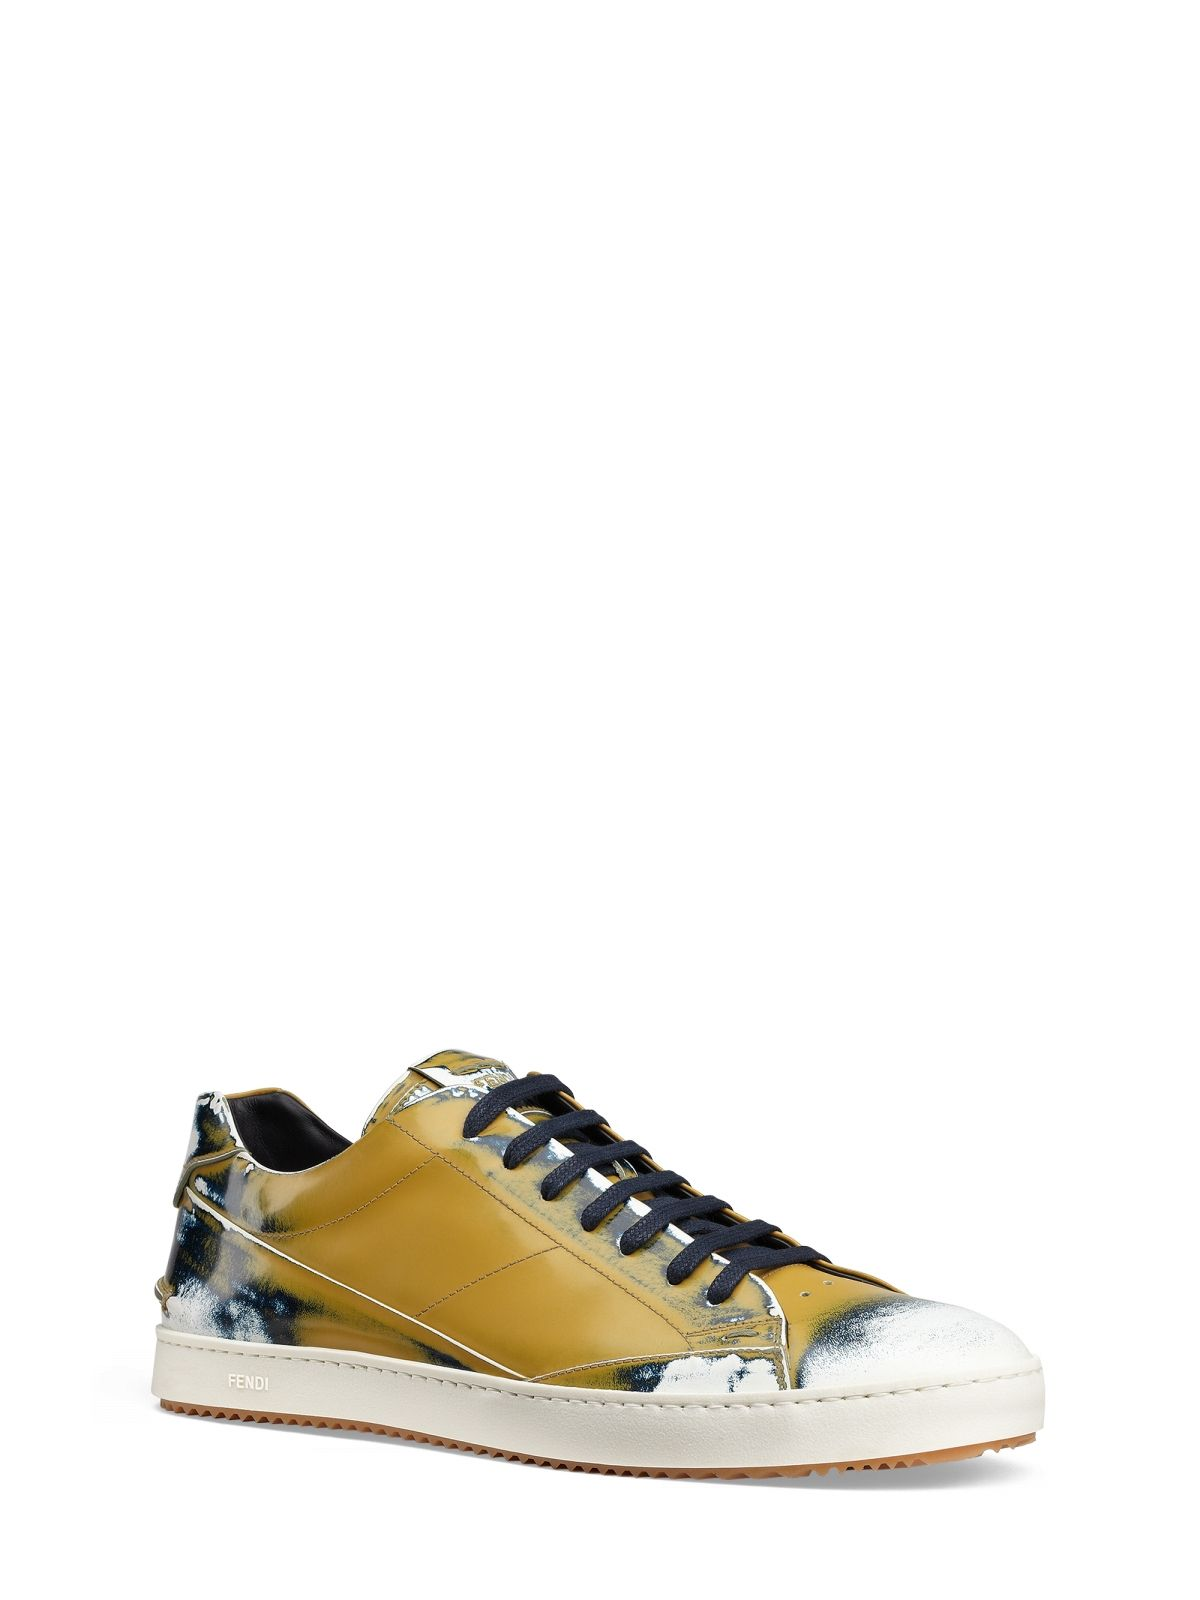 573fd0d3e8cbb Fendi - 7E0784 M5Z L07 Mens Designer Shoes, Men's Wardrobe, Lanvin, Luxury  Fashion